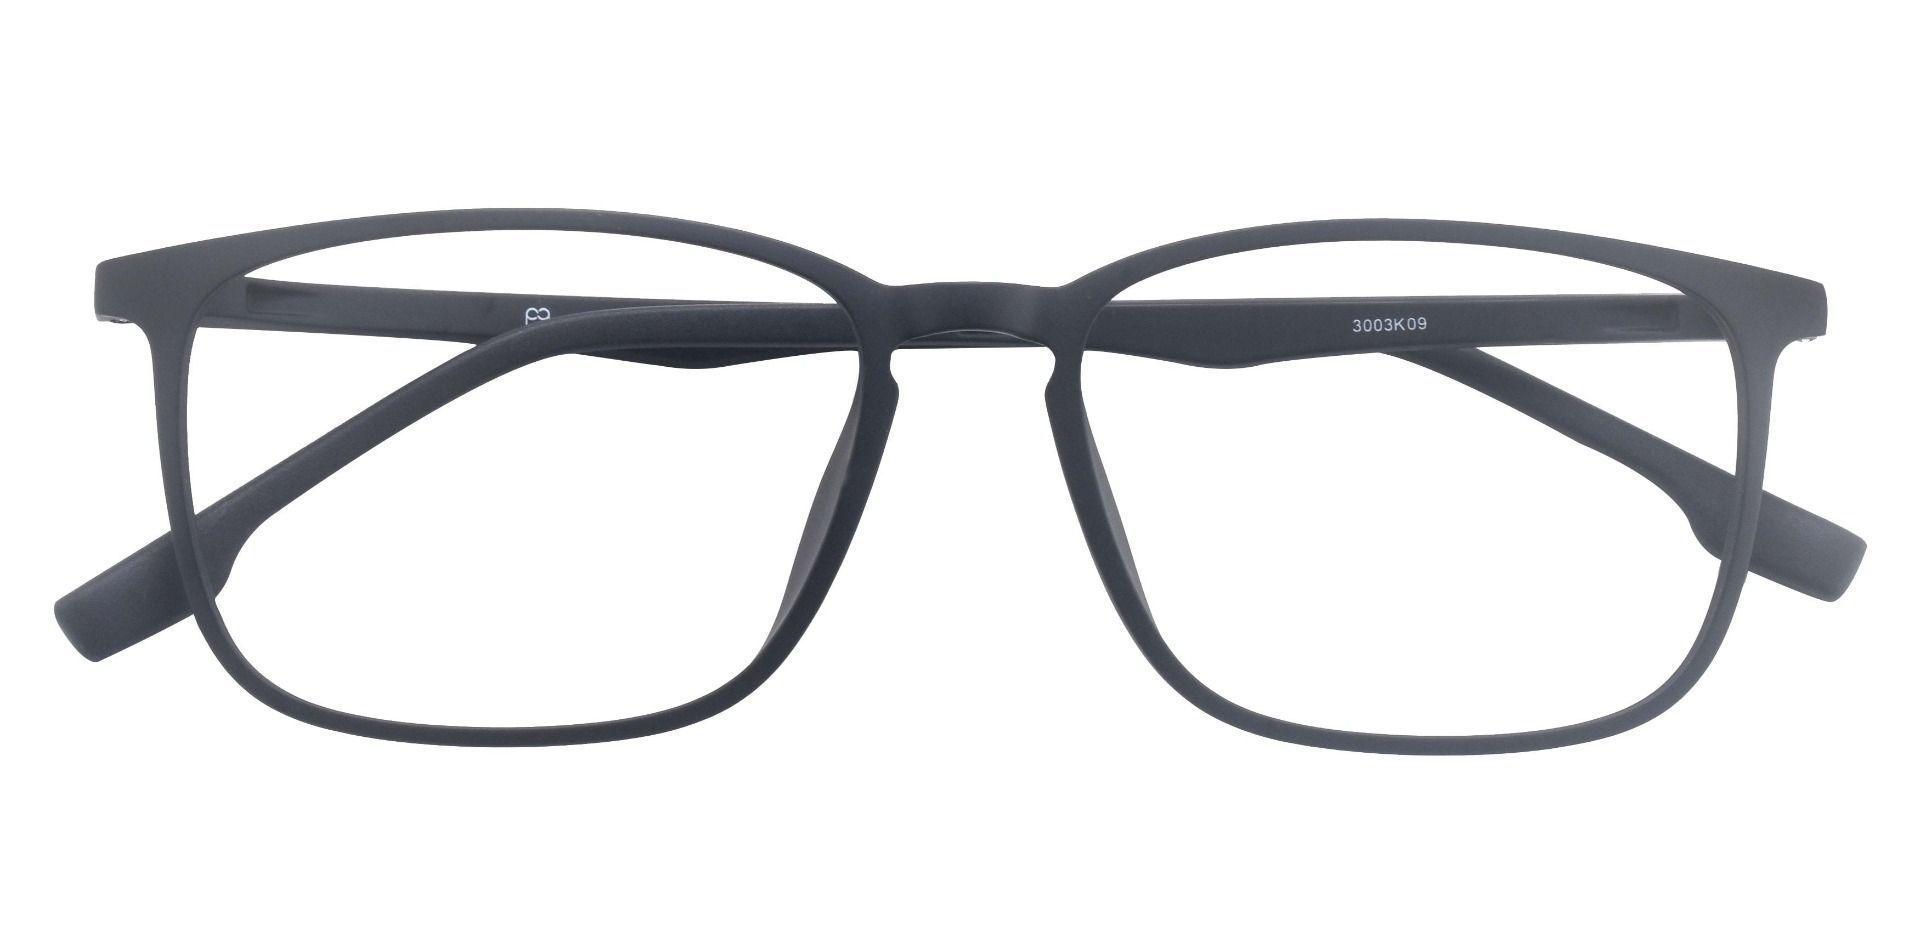 Denver Square Progressive Glasses -  Matte Black